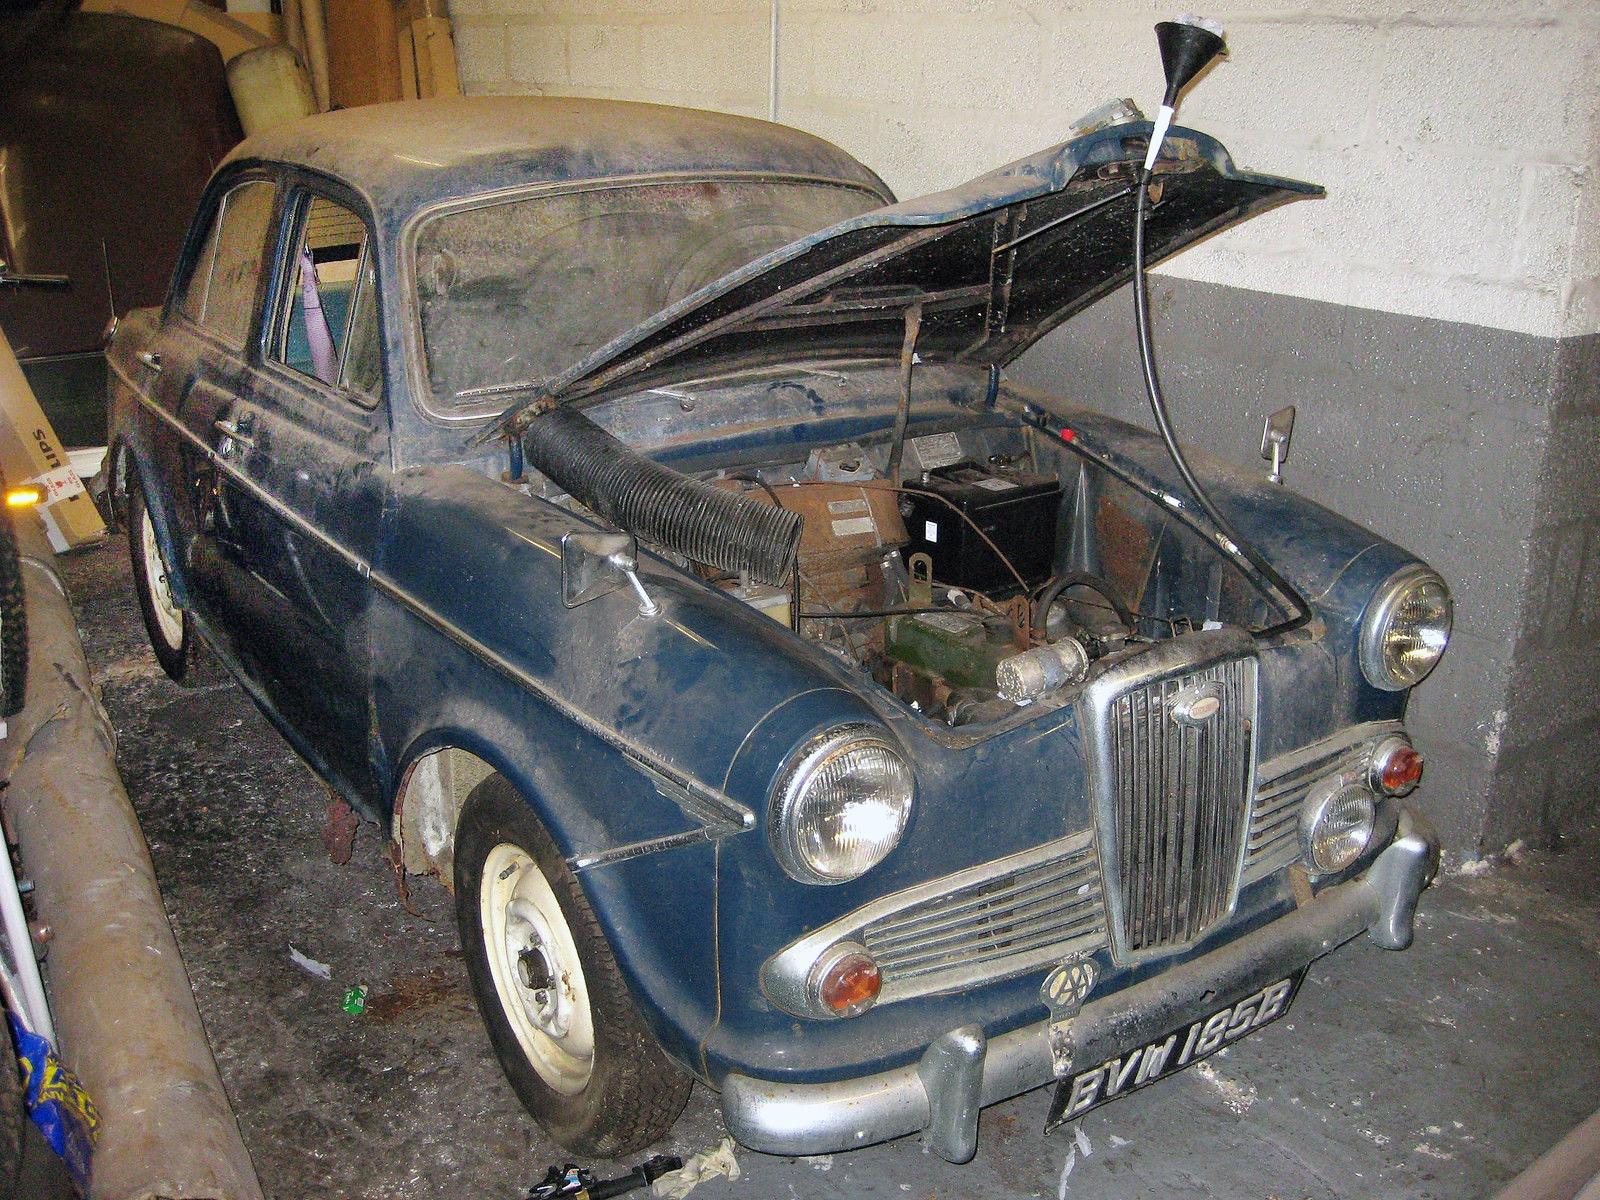 Waltzing Matilda 1964 Wolseley 1500